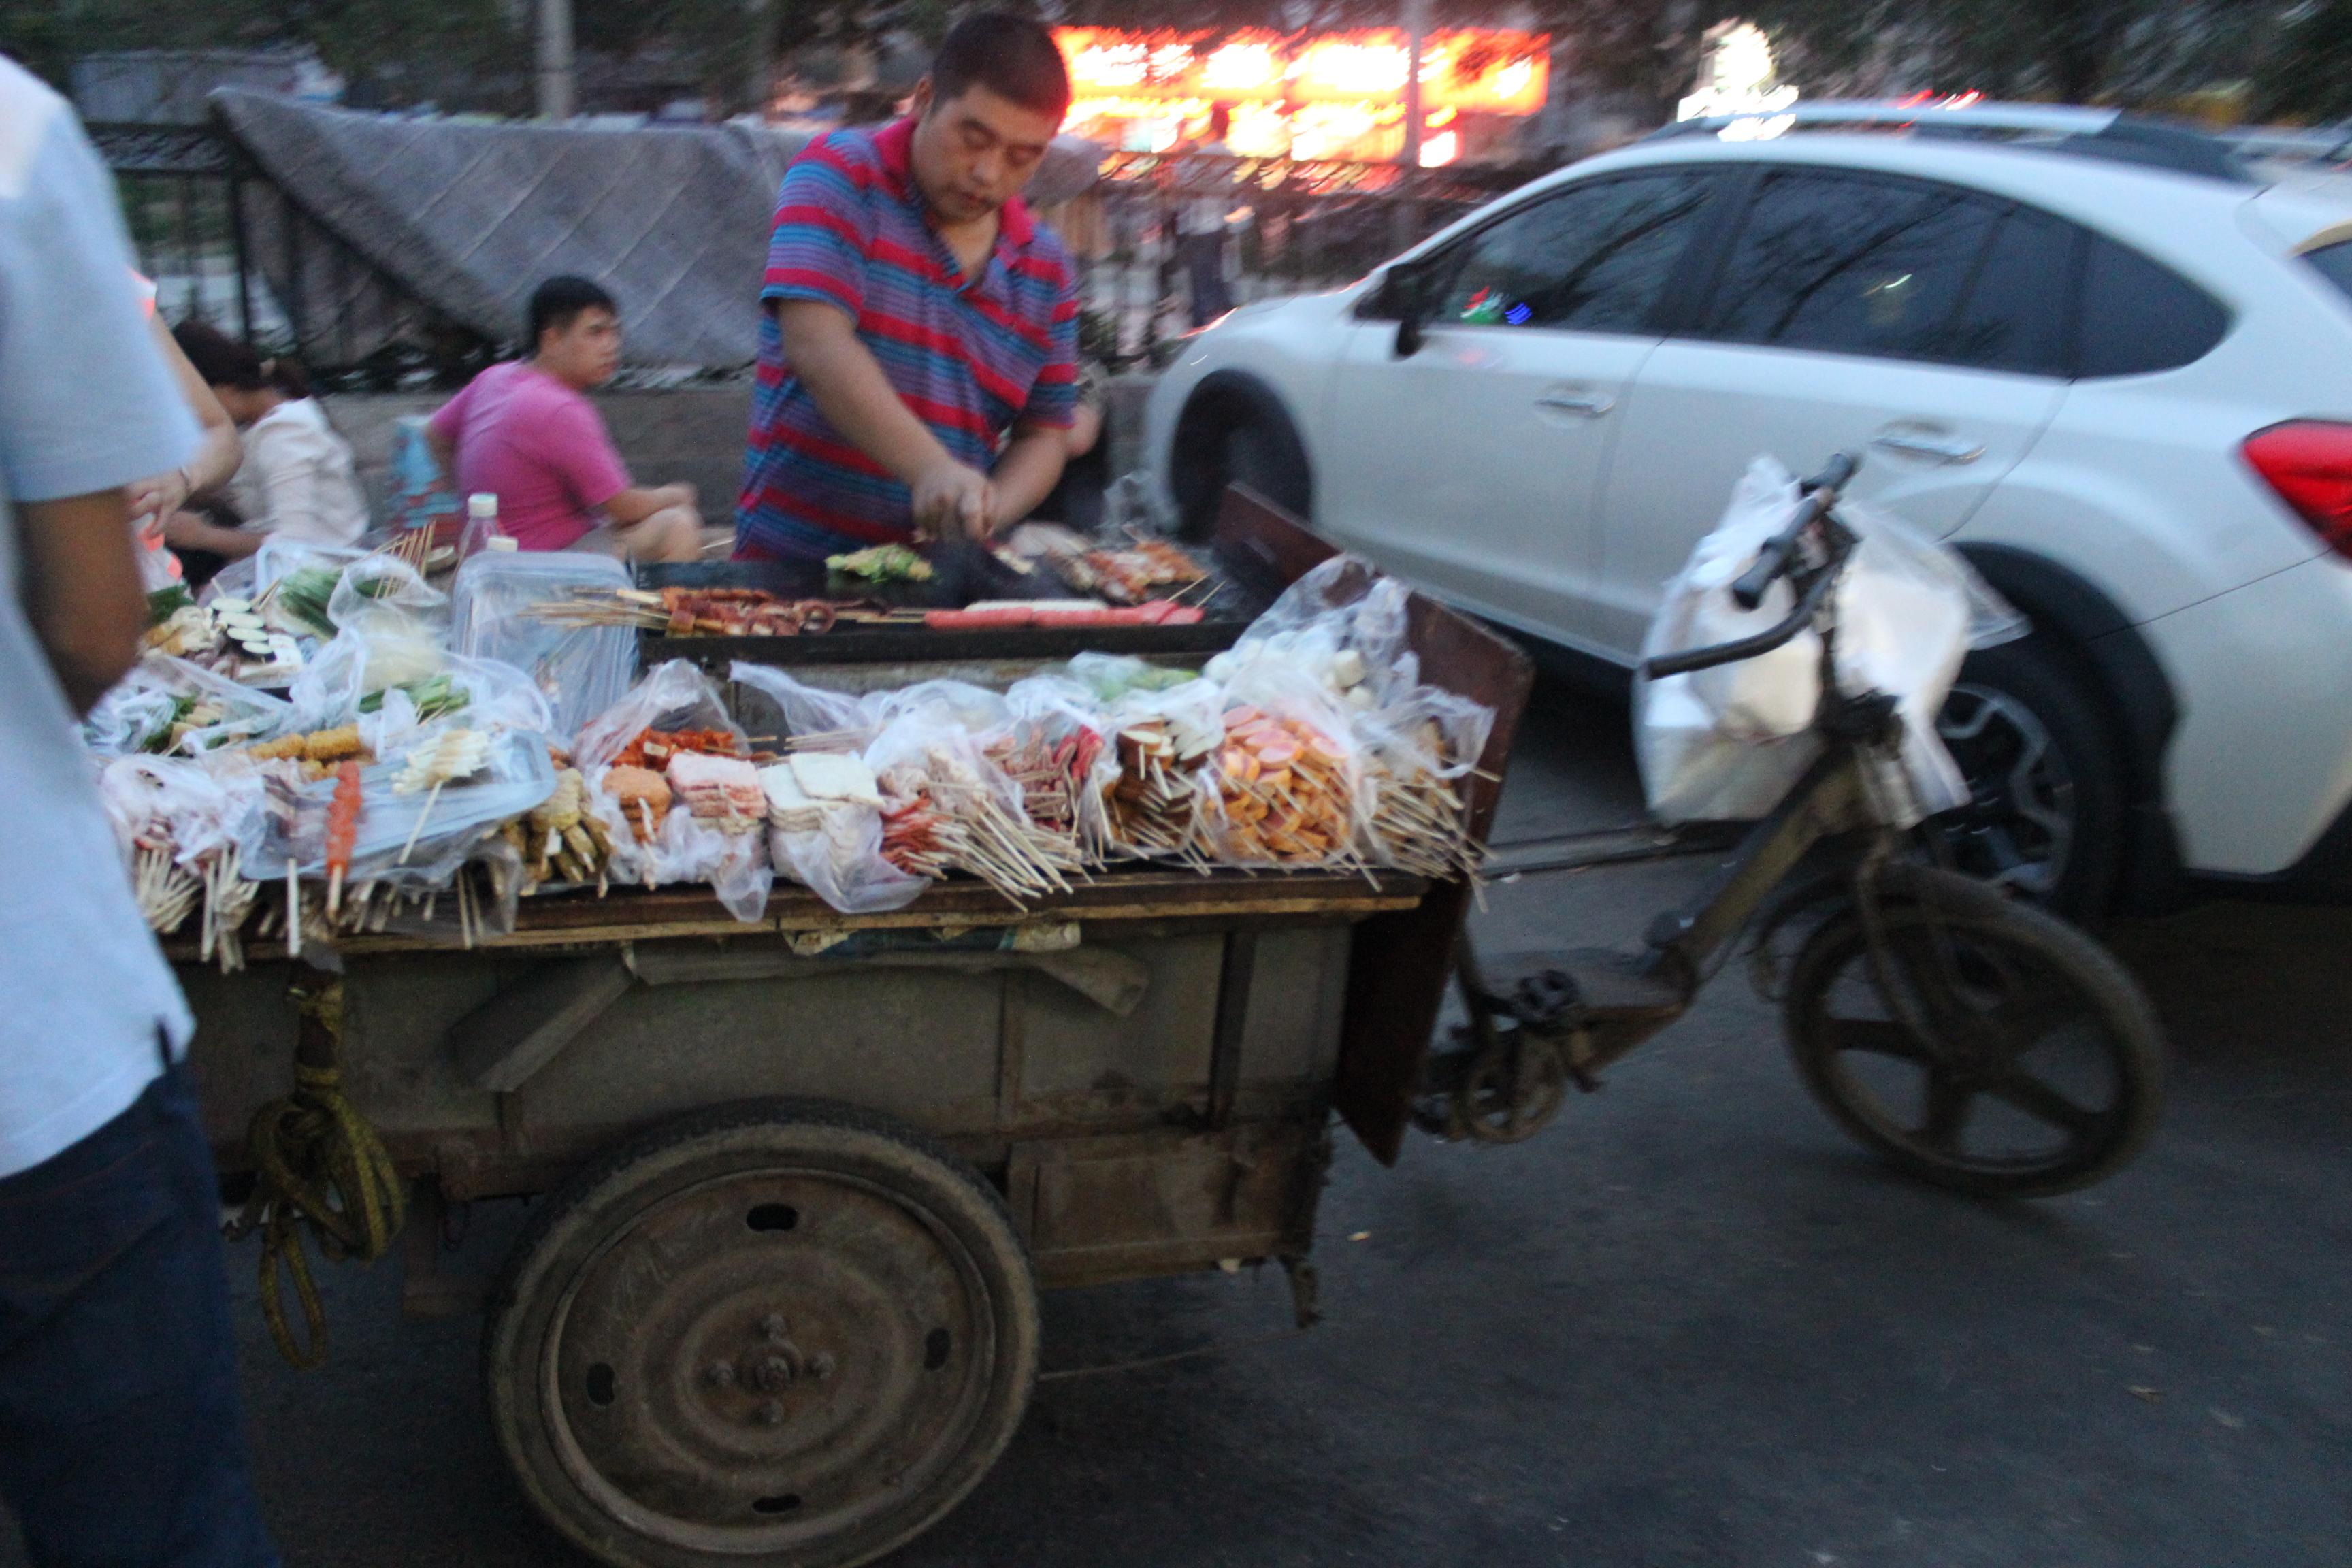 CAPAStudyAbroad_Bejing_Fall2014_from_Jasheah_Howard_-_Cuisine_3